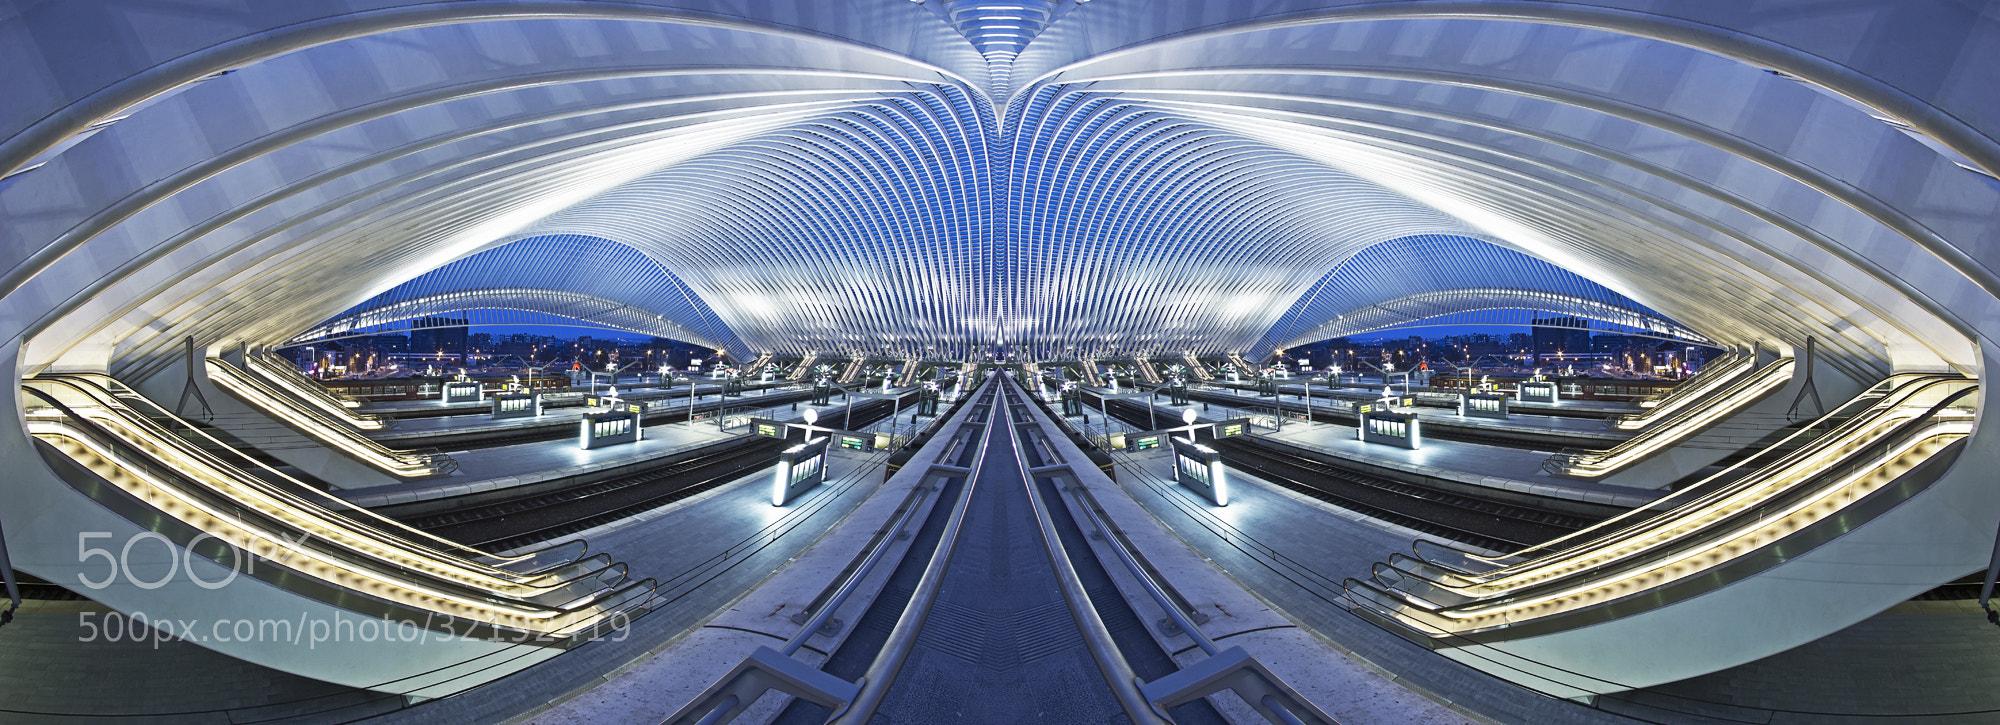 Photograph Calatravanism LXX - interpretation by Arnd Gottschalk on 500px